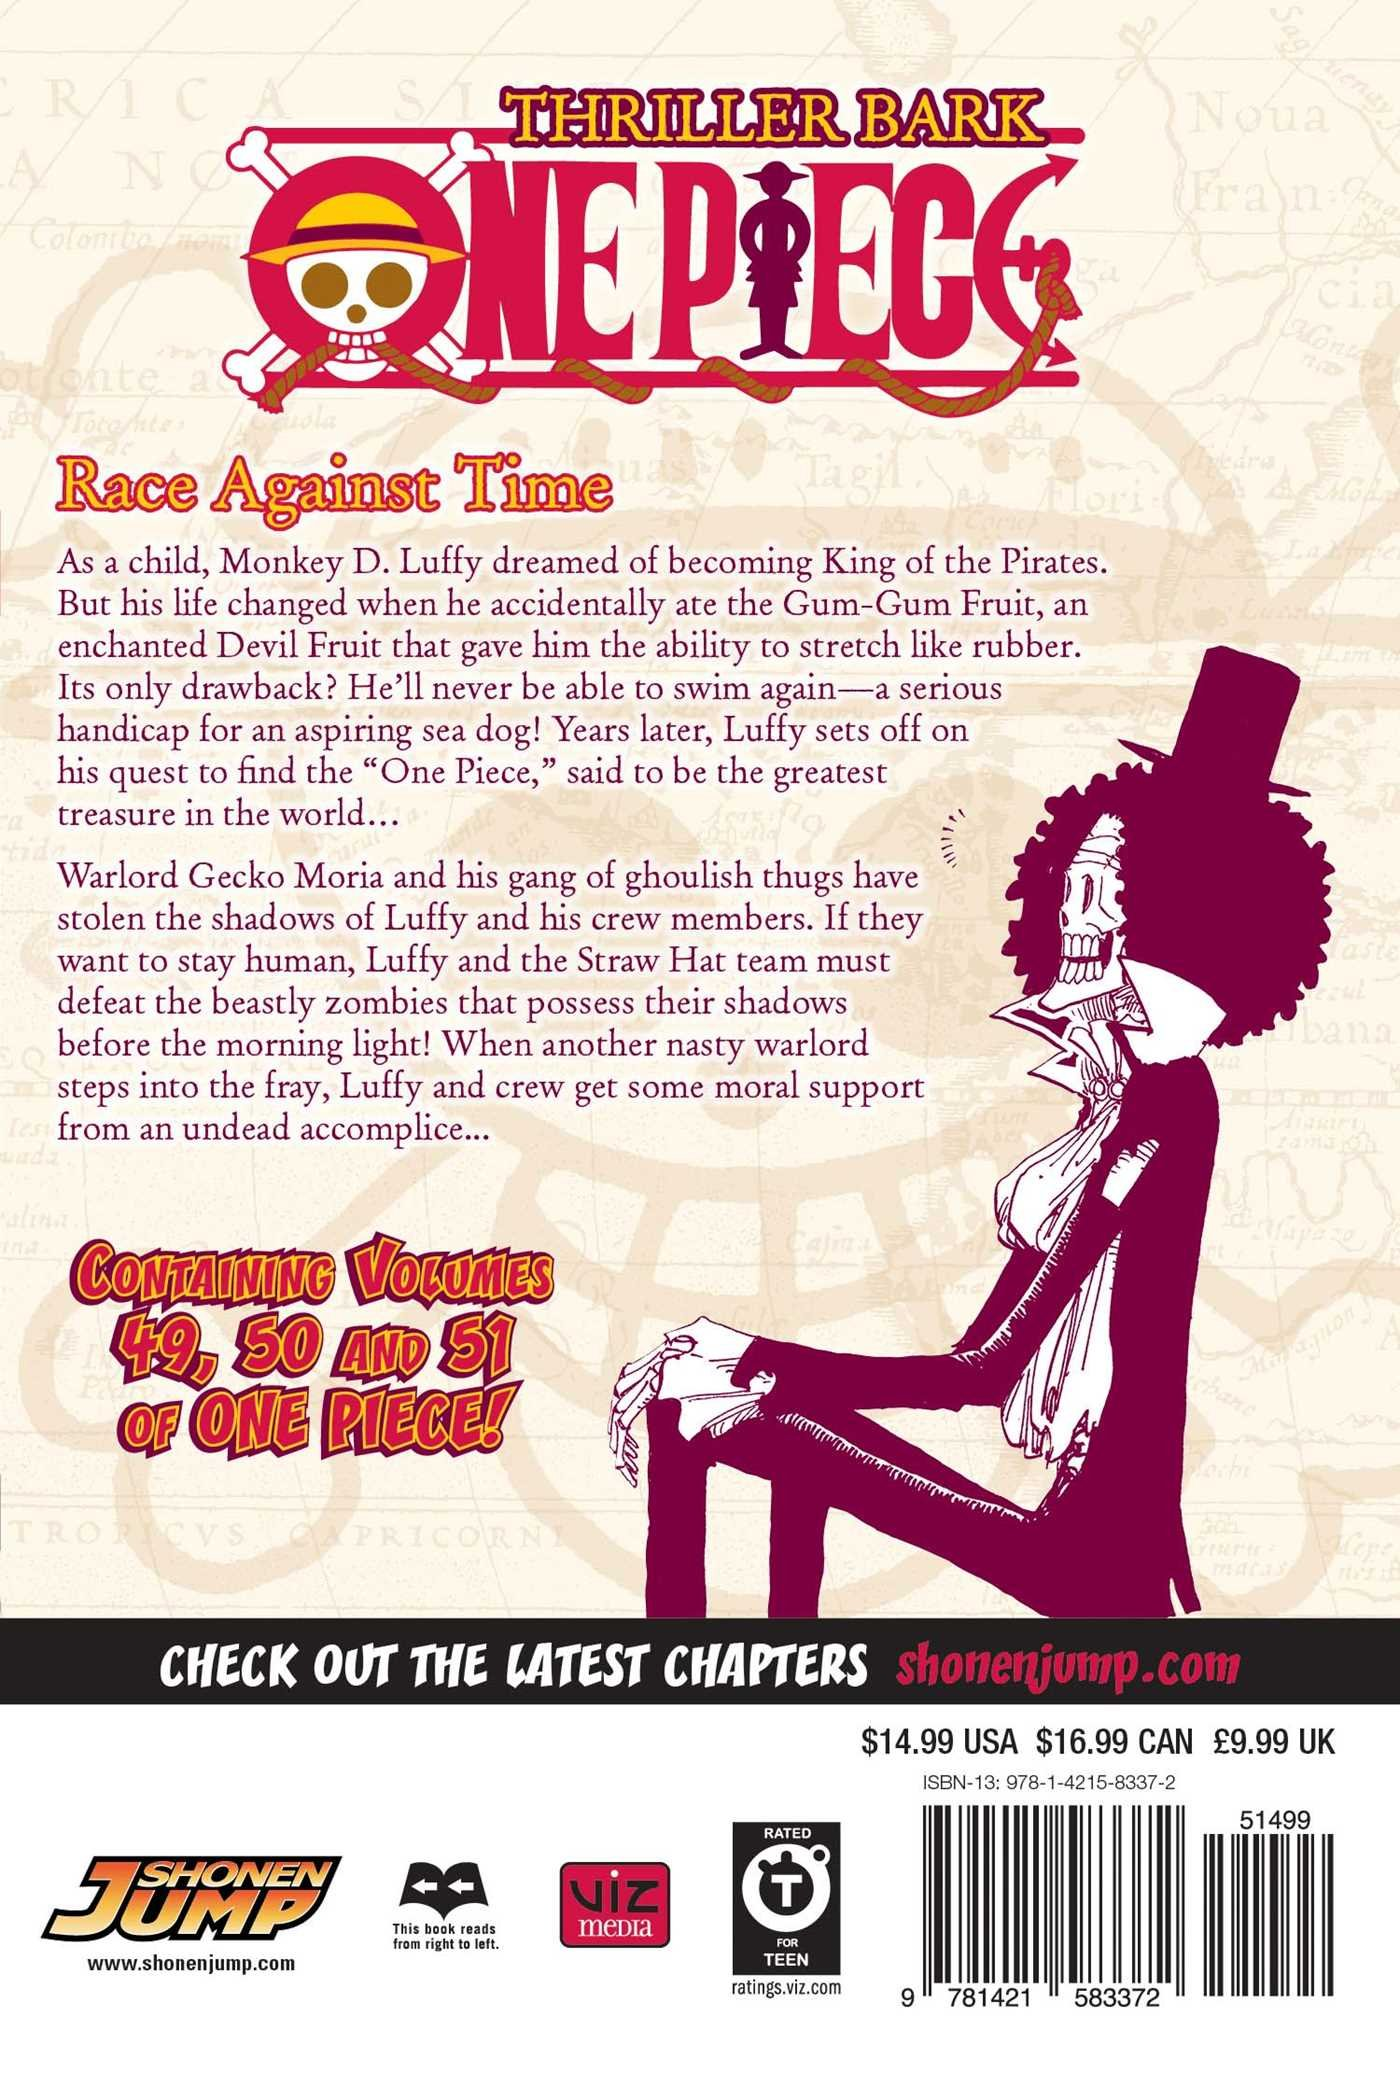 One Piece Omnibus Edition Volume 20 Includes vols. 20, 20 & 20 ...